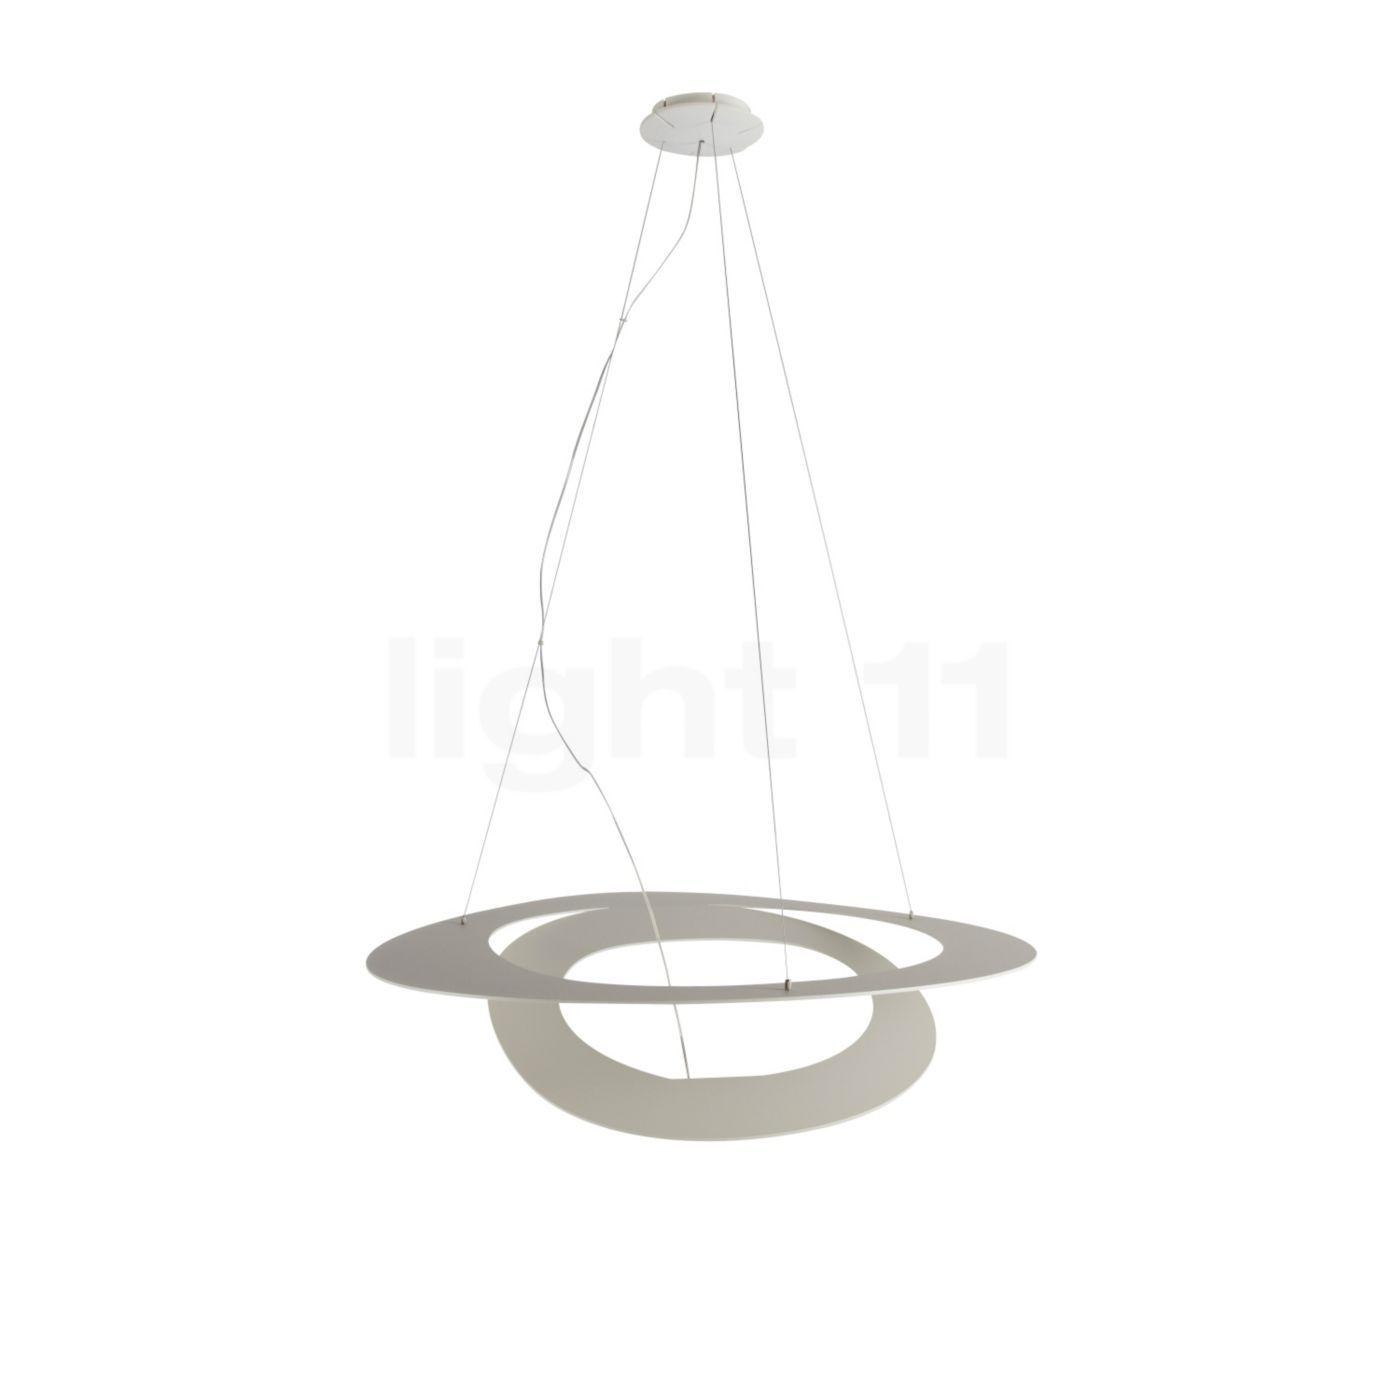 Artemide Pirce Sospensione   Ceiling lights, Mini, Decor